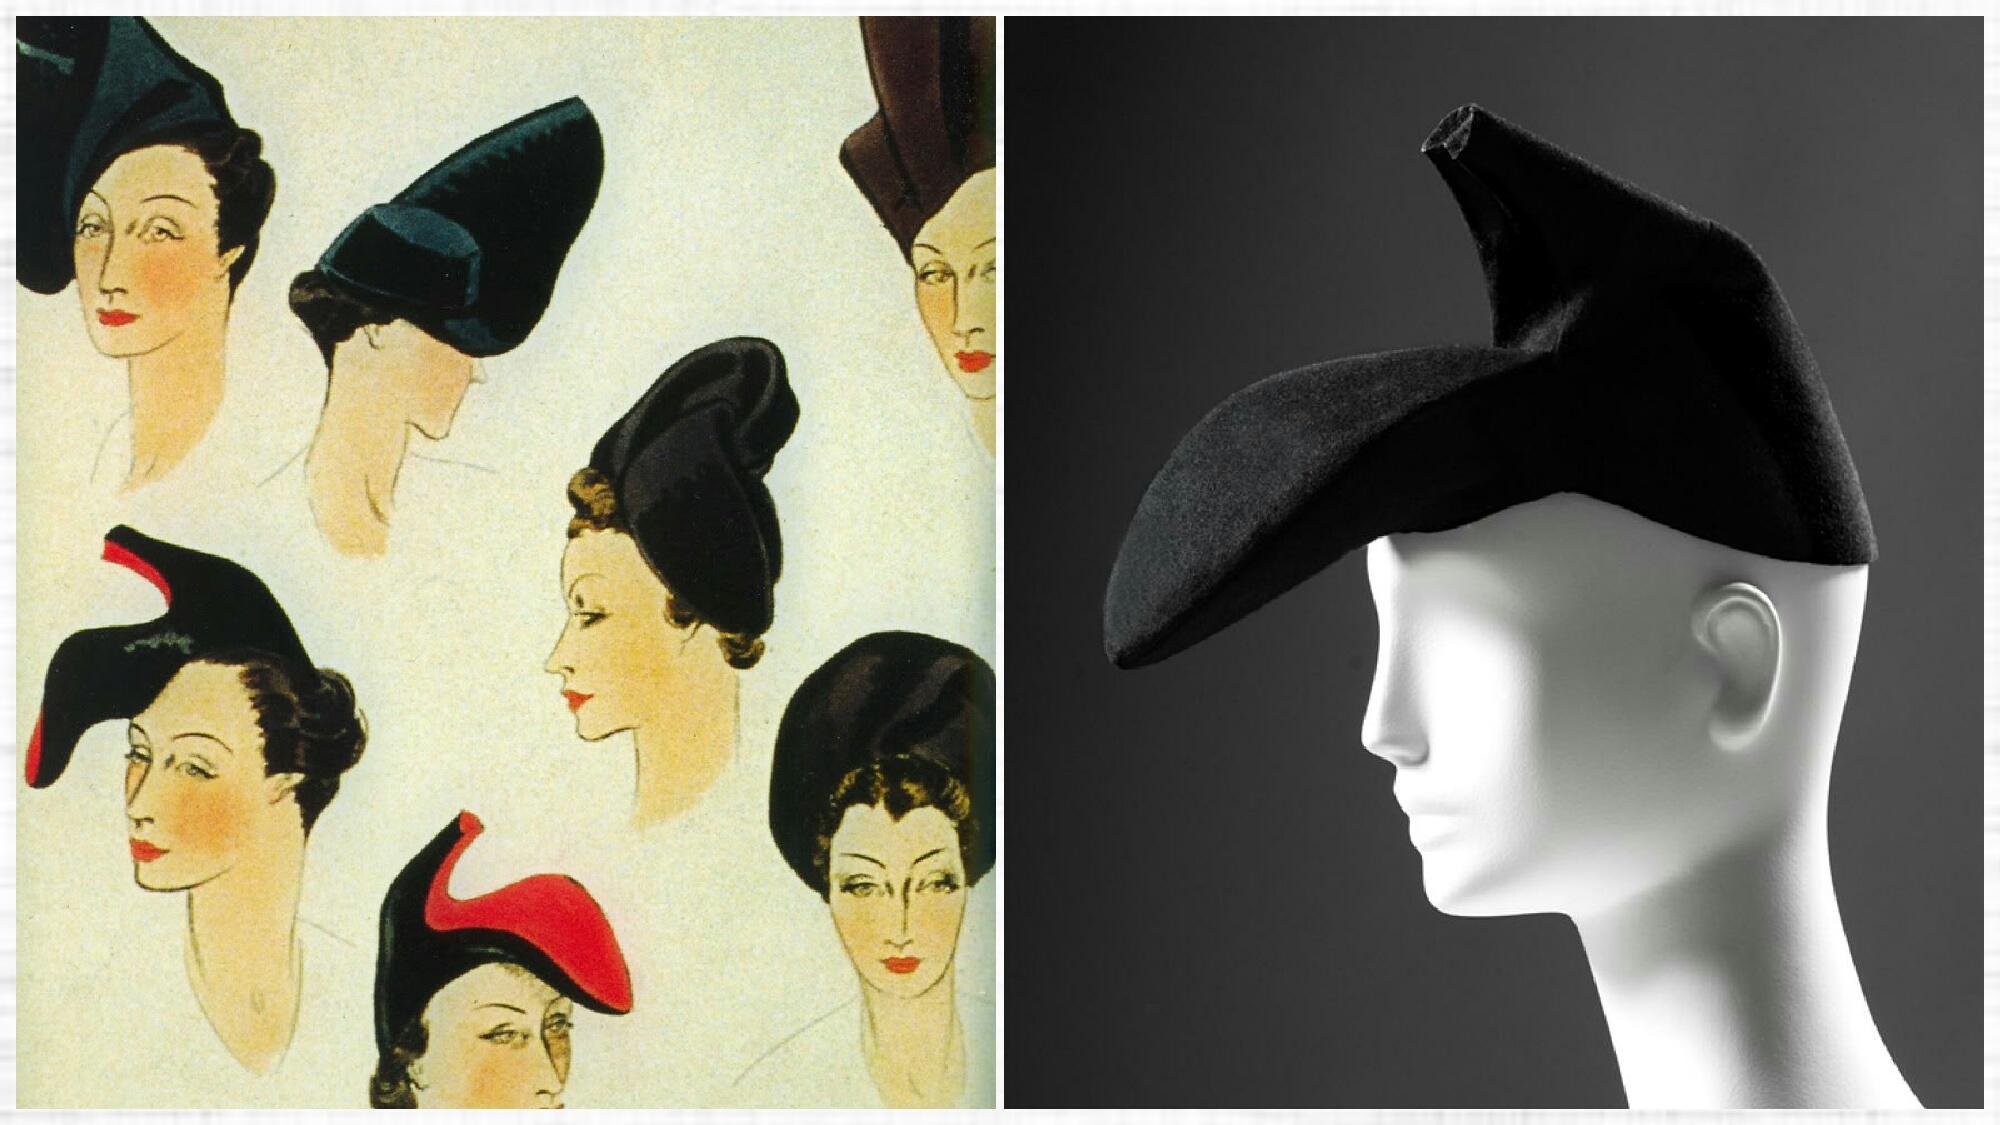 Shoe hat by Elsa Schiaparelli, courtesy of Palais Galliera